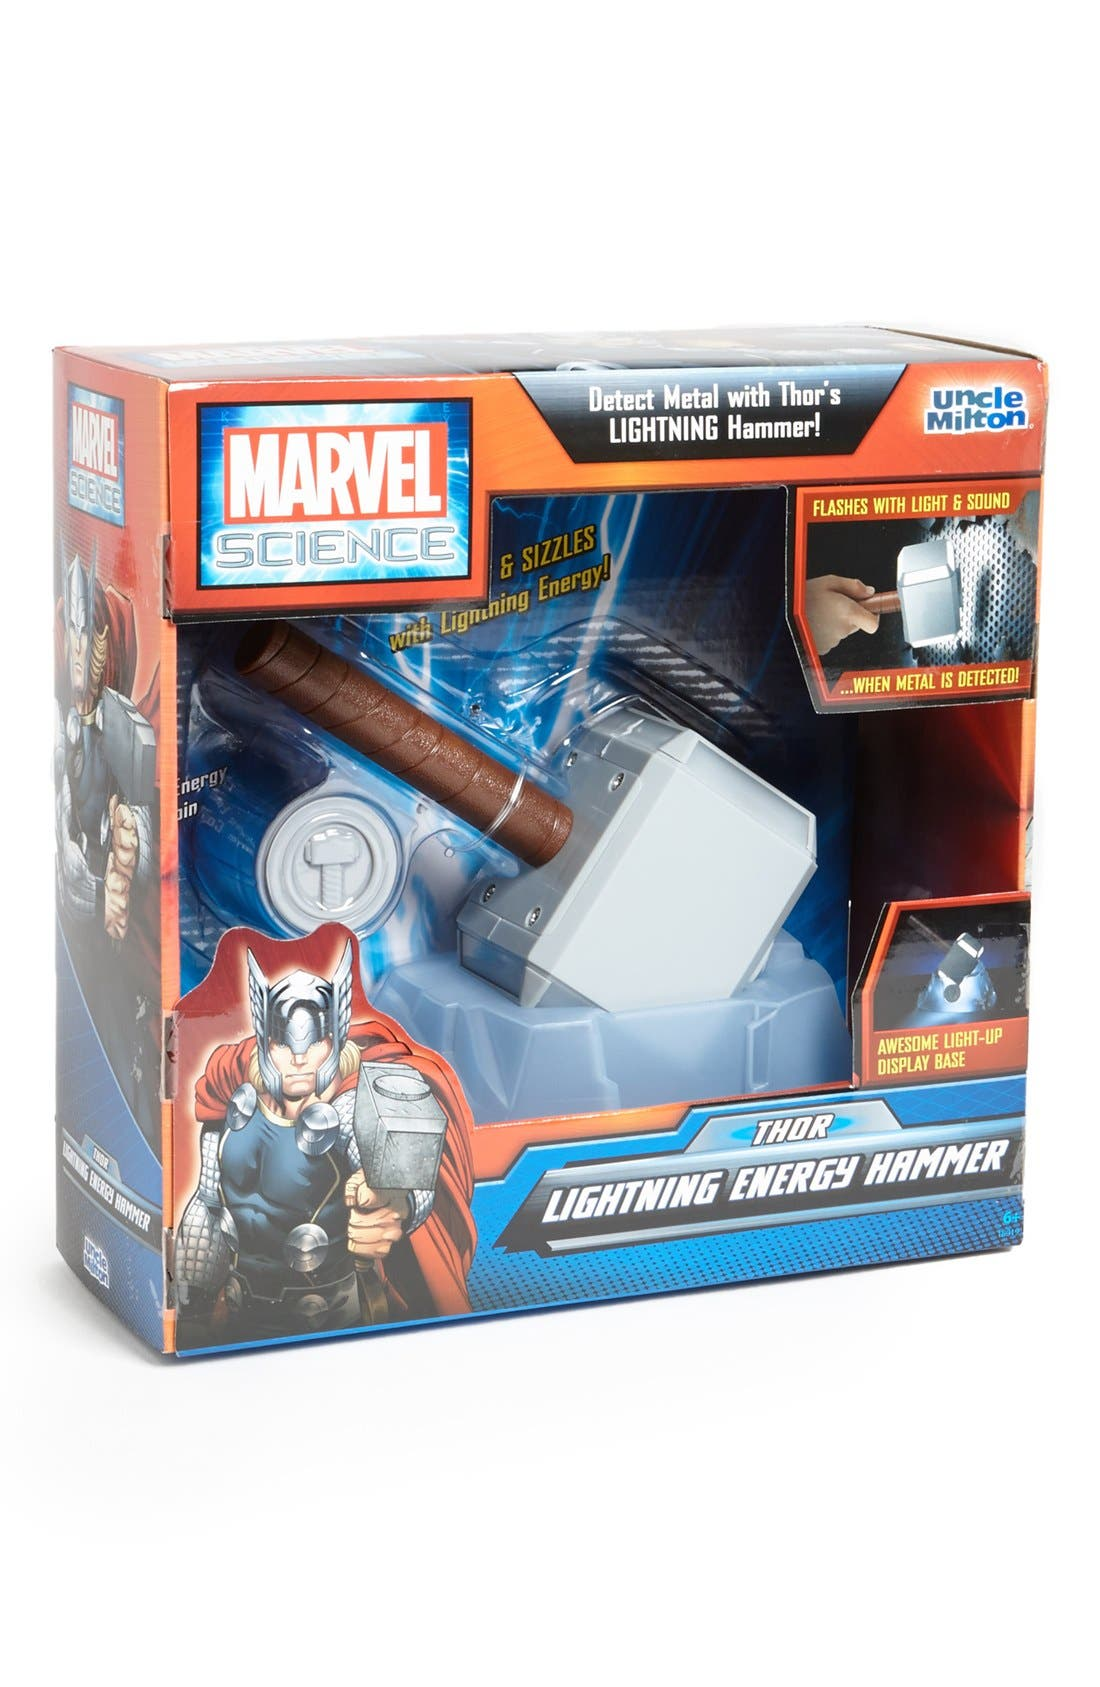 Alternate Image 1 Selected - Uncle Milton 'Thor's Lightning' Energy Hammer